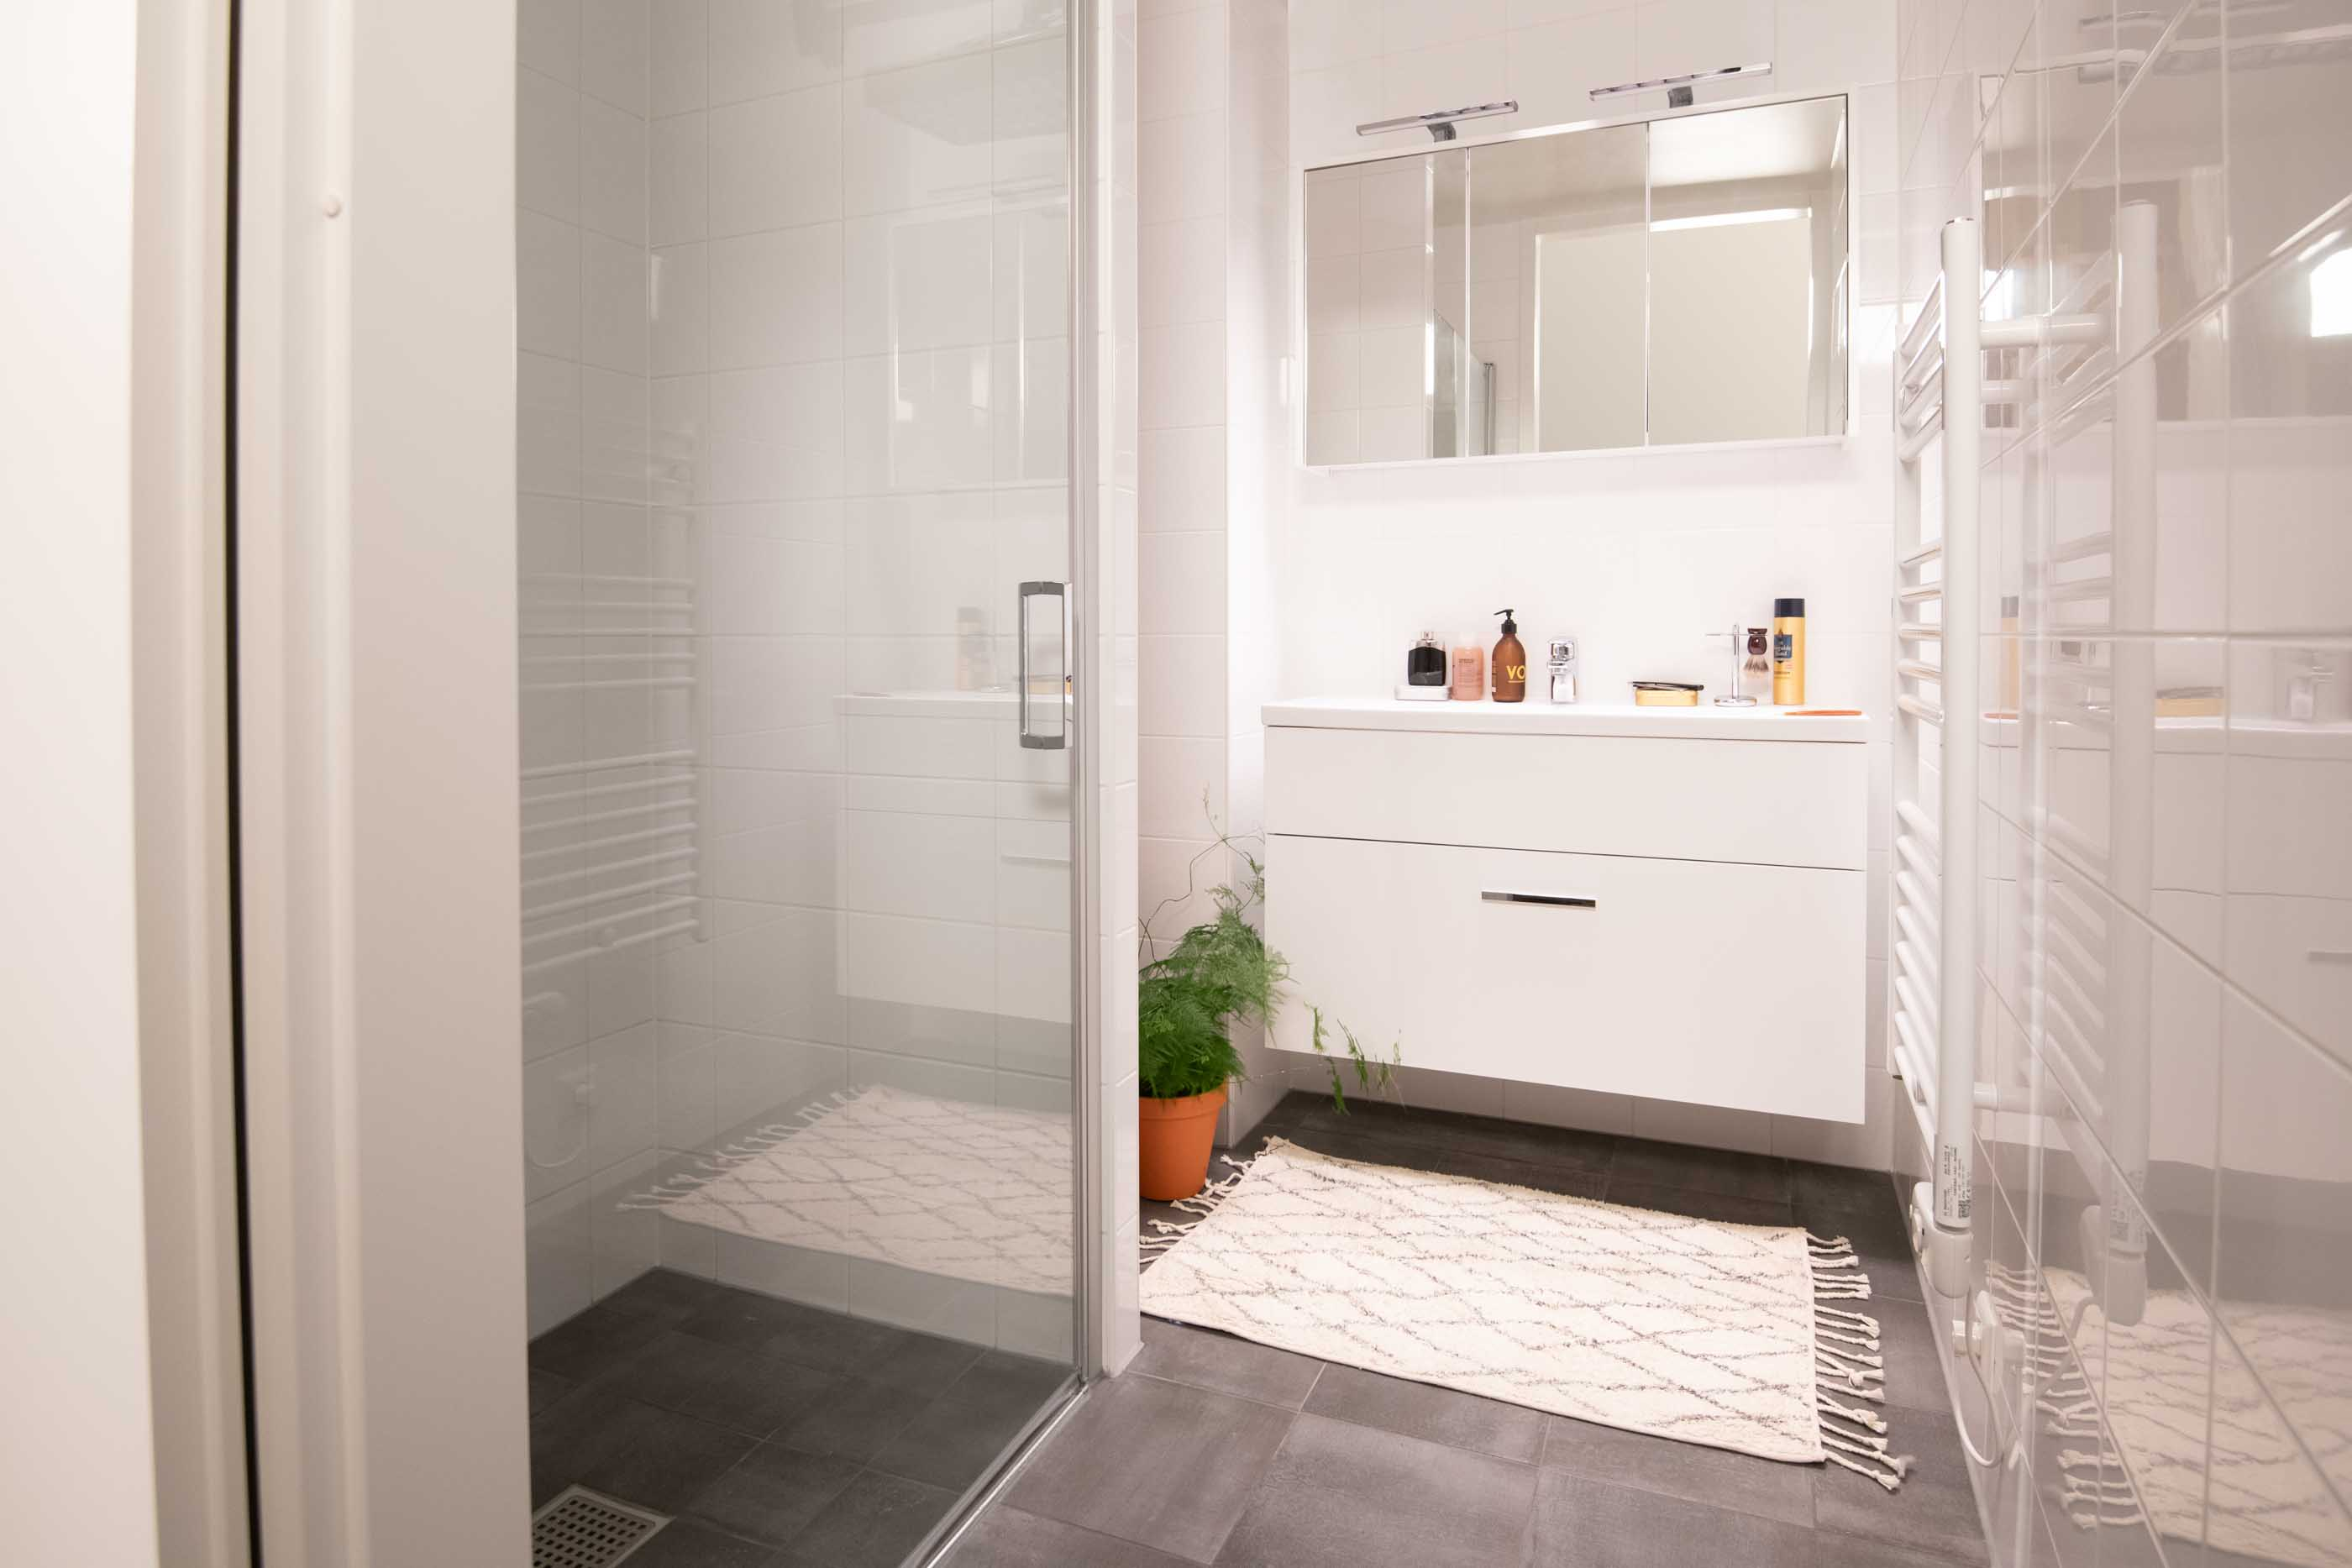 1-bedroom Apartment in OurDomain Amsterdam Diemen Interiors - Bathroom